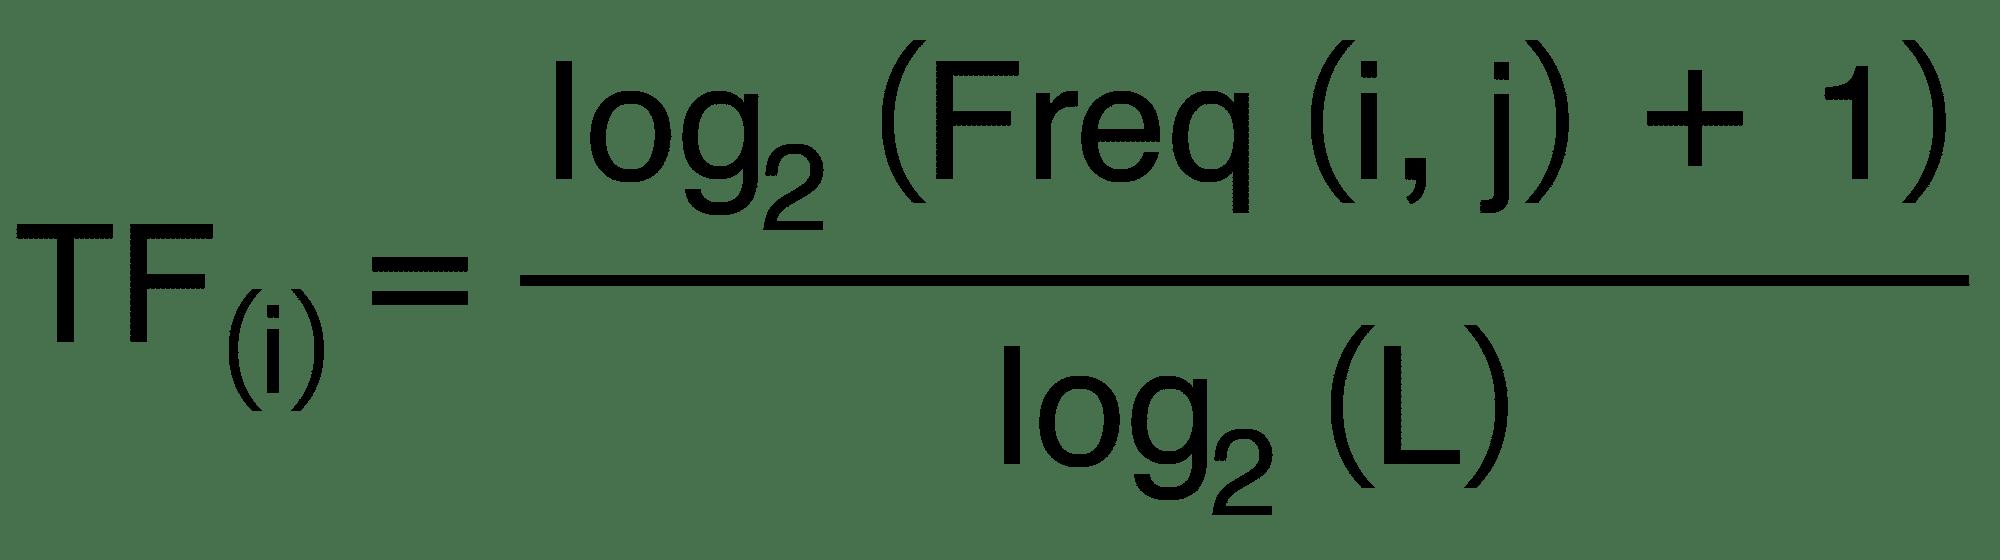 Formel zur Berechnung der Termfrequenz (TF)